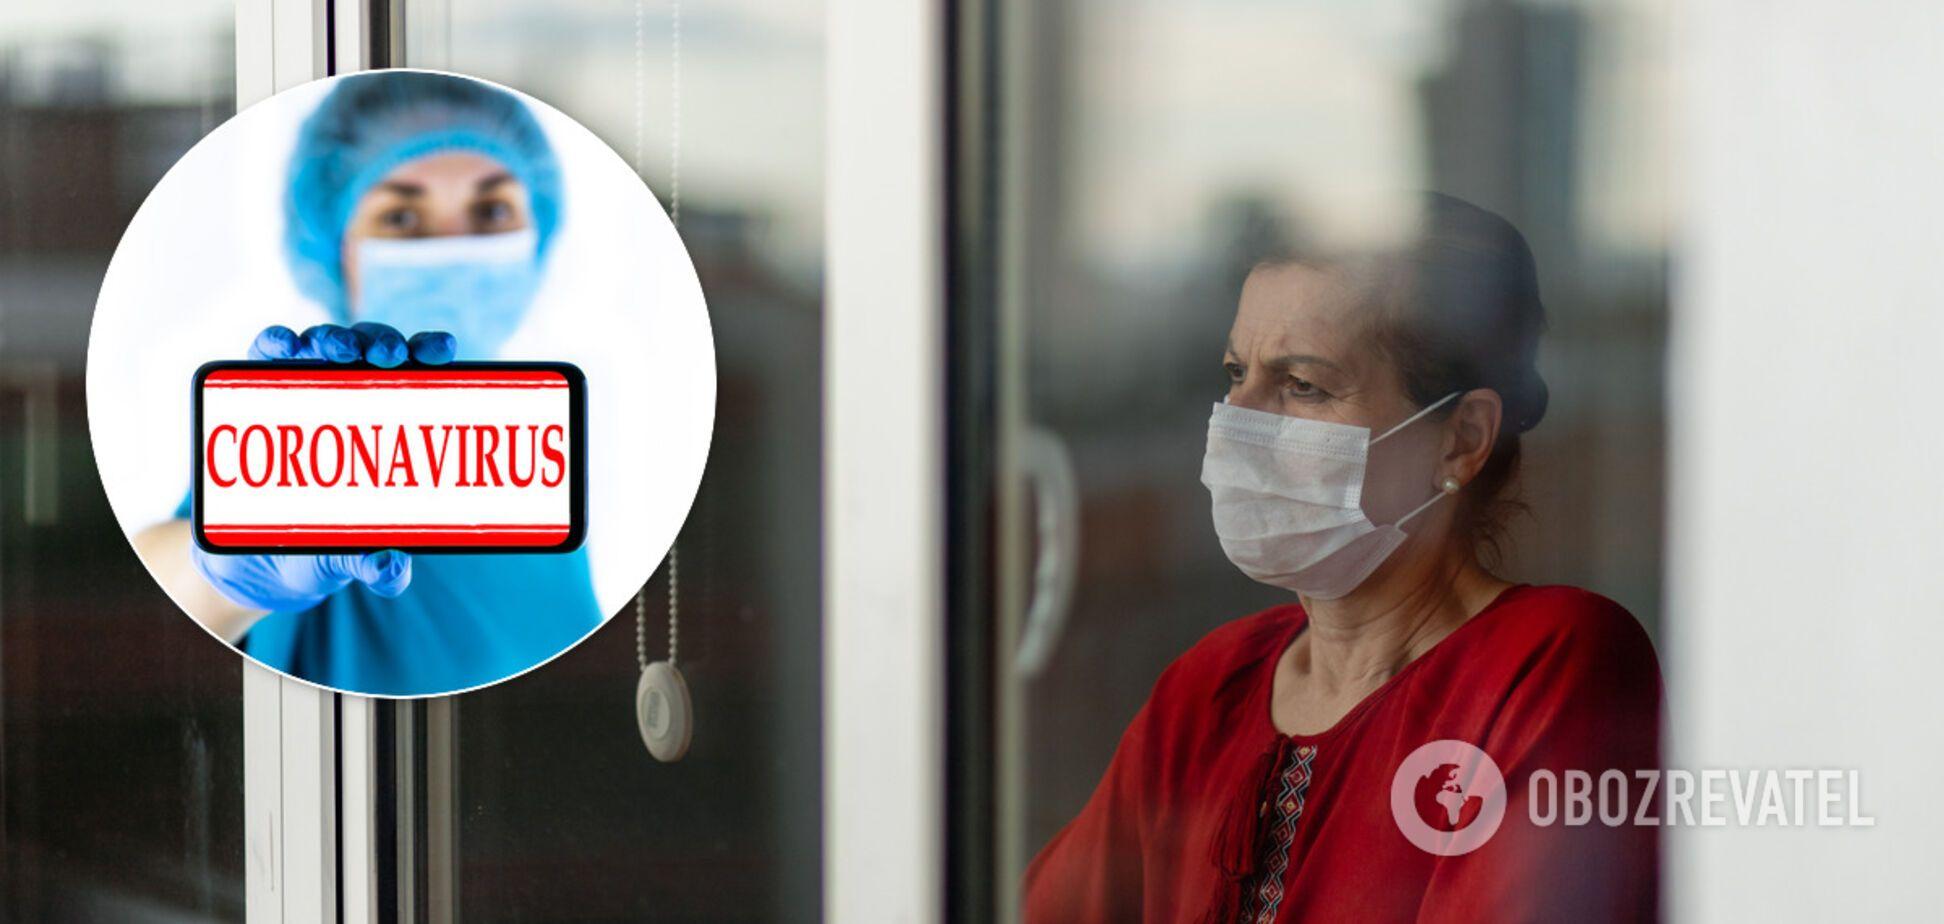 Украинский врач из Италии рассказала о новом симптоме COVID-19 и опасности 'Плаквенила'